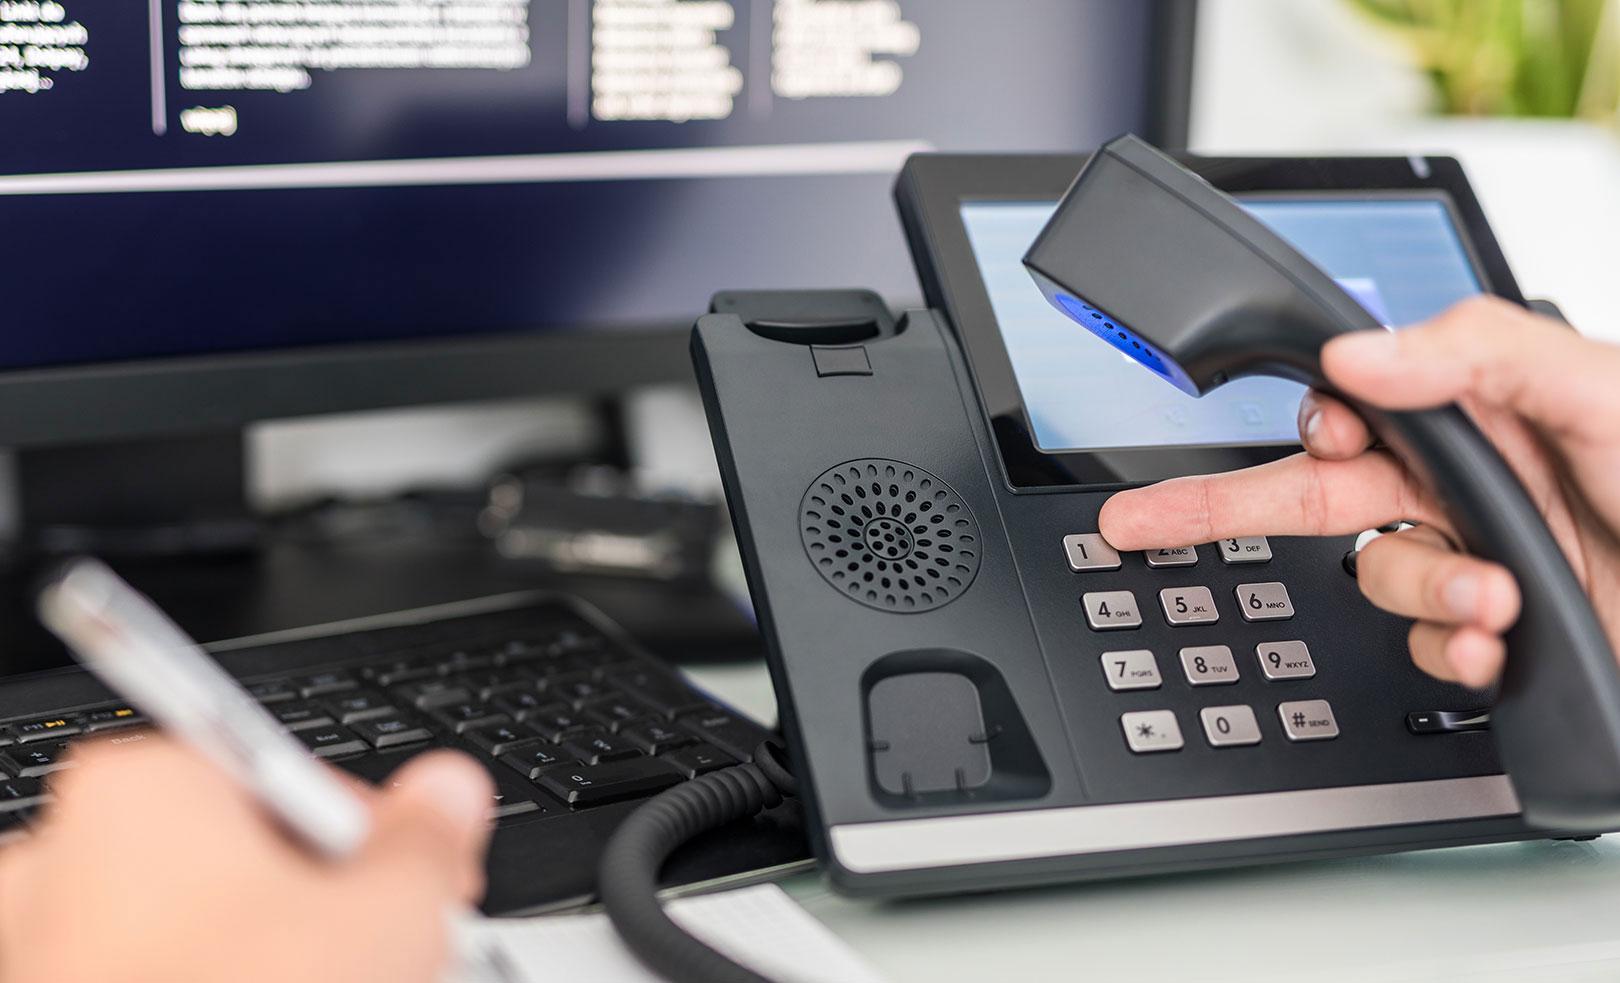 Dialing-on-modern-digital-PBX-phone